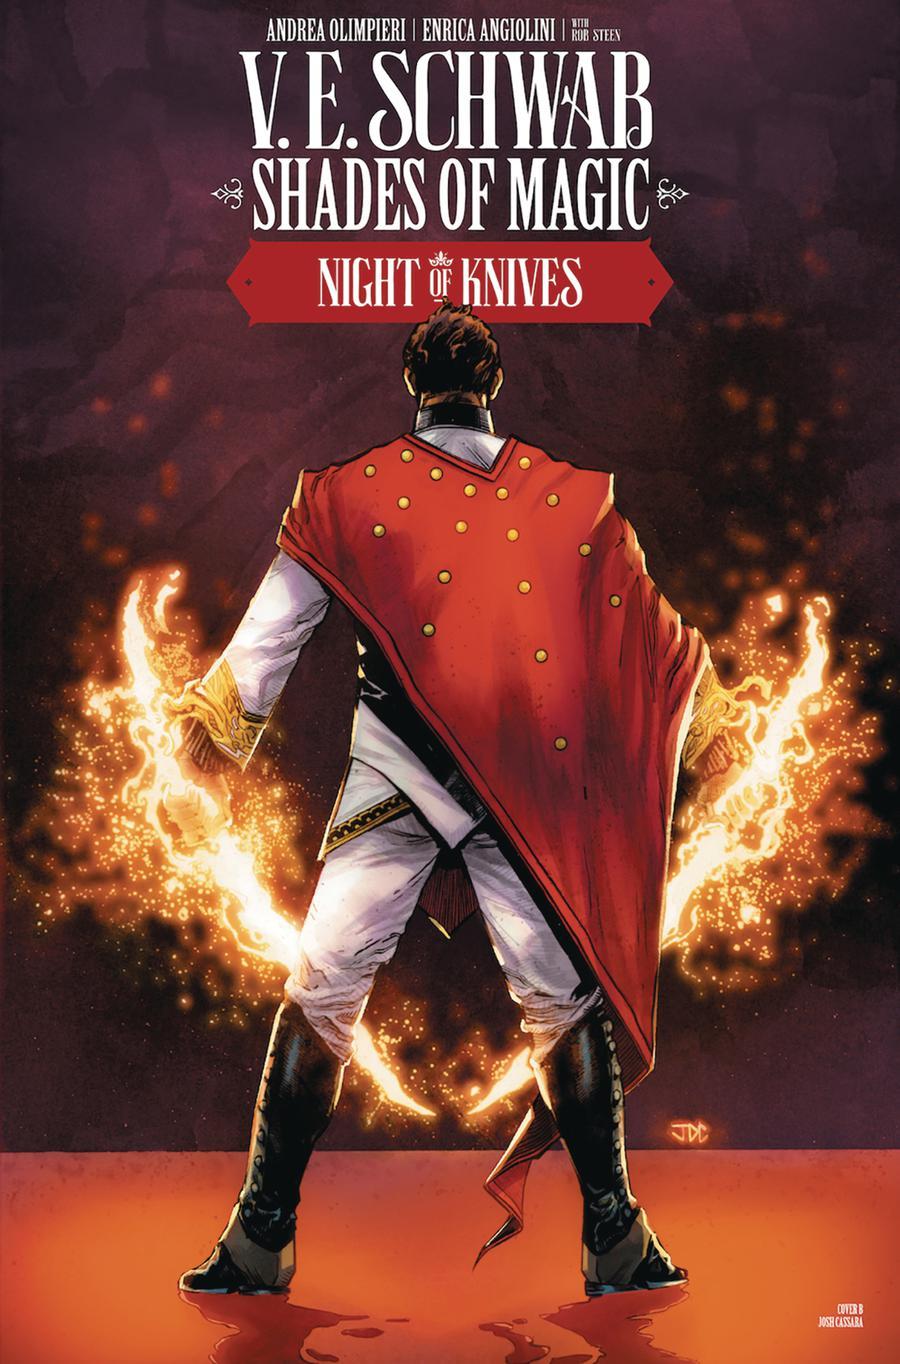 Shades Of Magic #5 Night Of Knives Cover B Variant Josh Cassara Cover